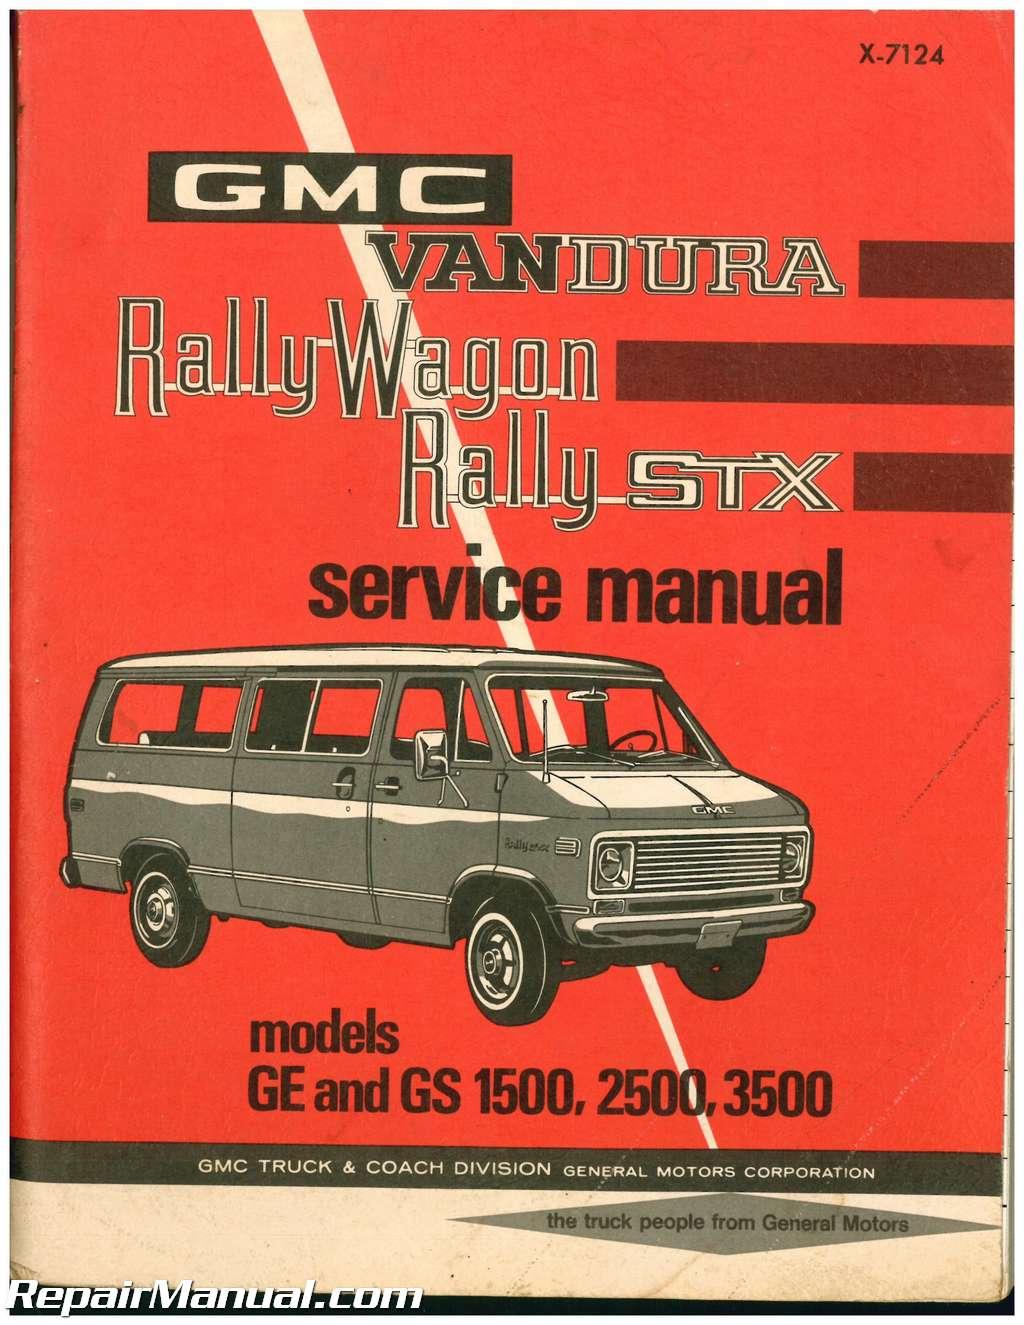 used 1971 gmc vandura rally wagon rally stx service manual